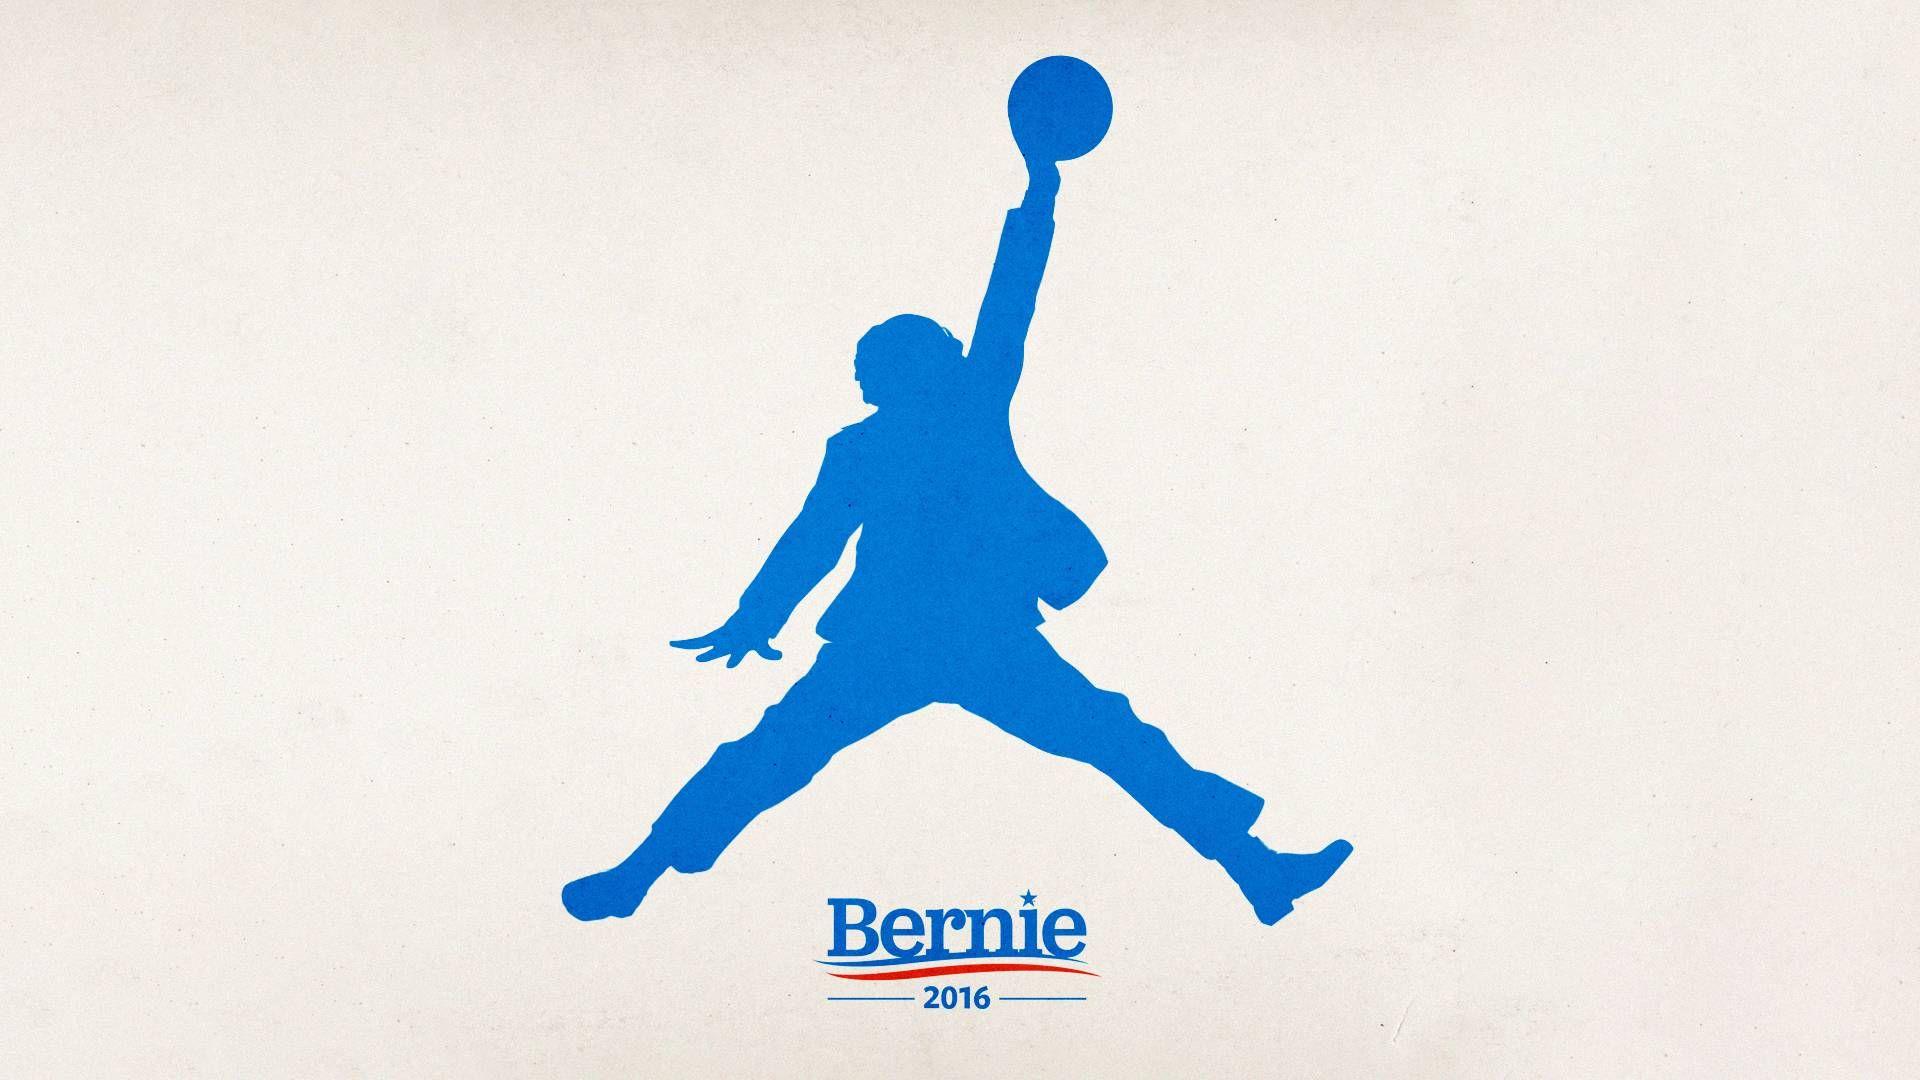 Michael jordan iphone wallpaper tumblr - This Bernie Sanders Air Jordan Logo Mash Up Is Beautiful By Now You Ve Probably Seen The Video Of Bernie Sanders Ballin Outta Control After His Huge Win